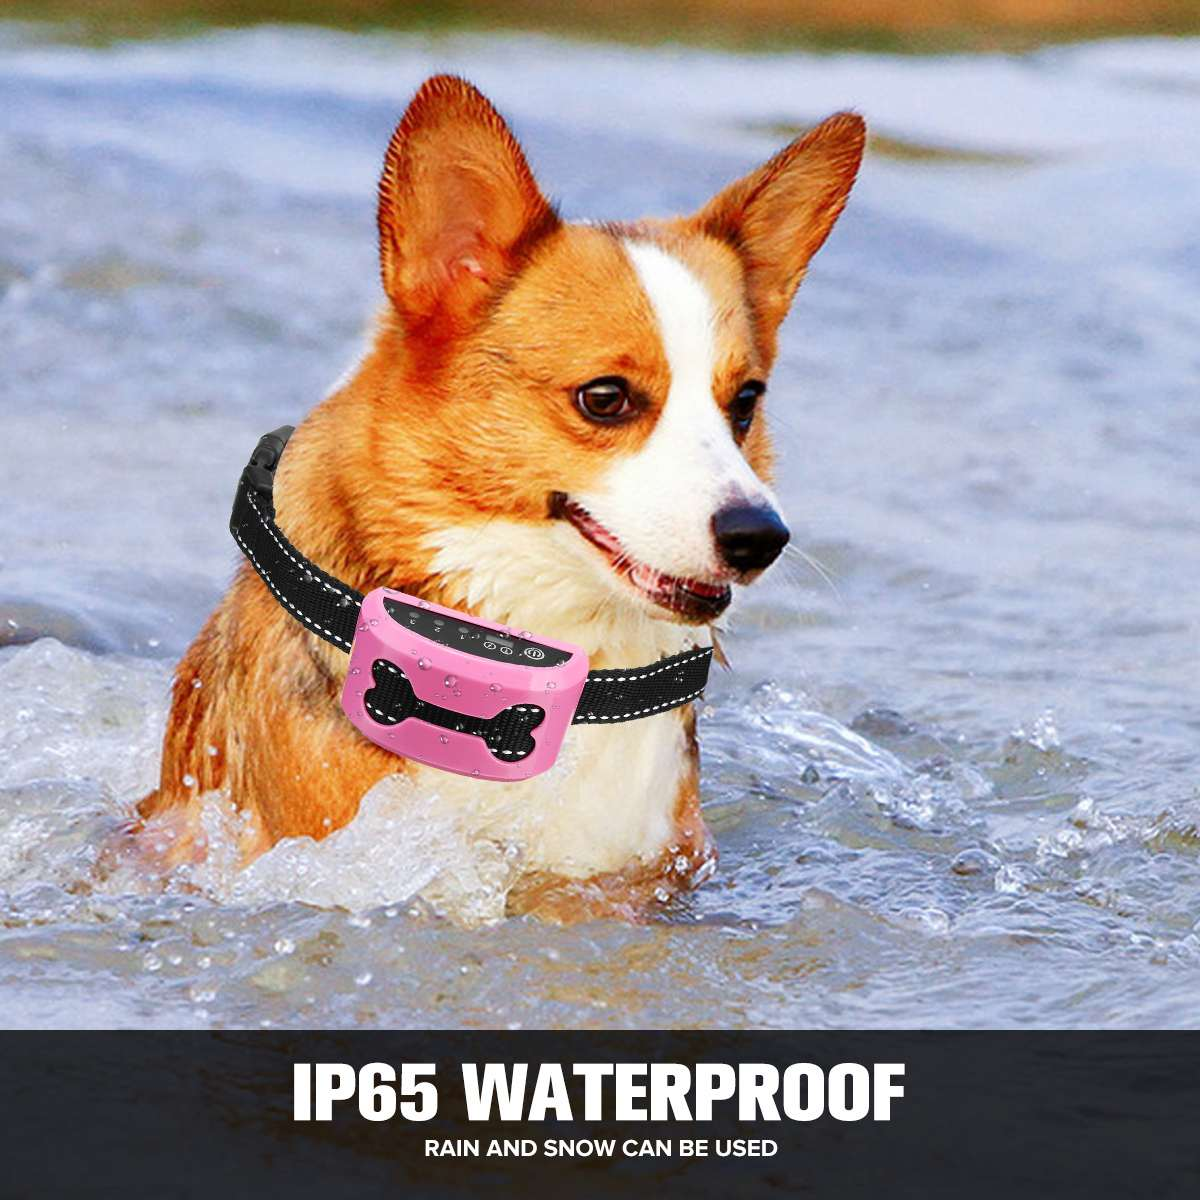 Electric Bark Control Collar for Dog Collar Anti Bark Dog Training Rechargeable Waterproof Shock Collar Auto Anti Bark Device 3